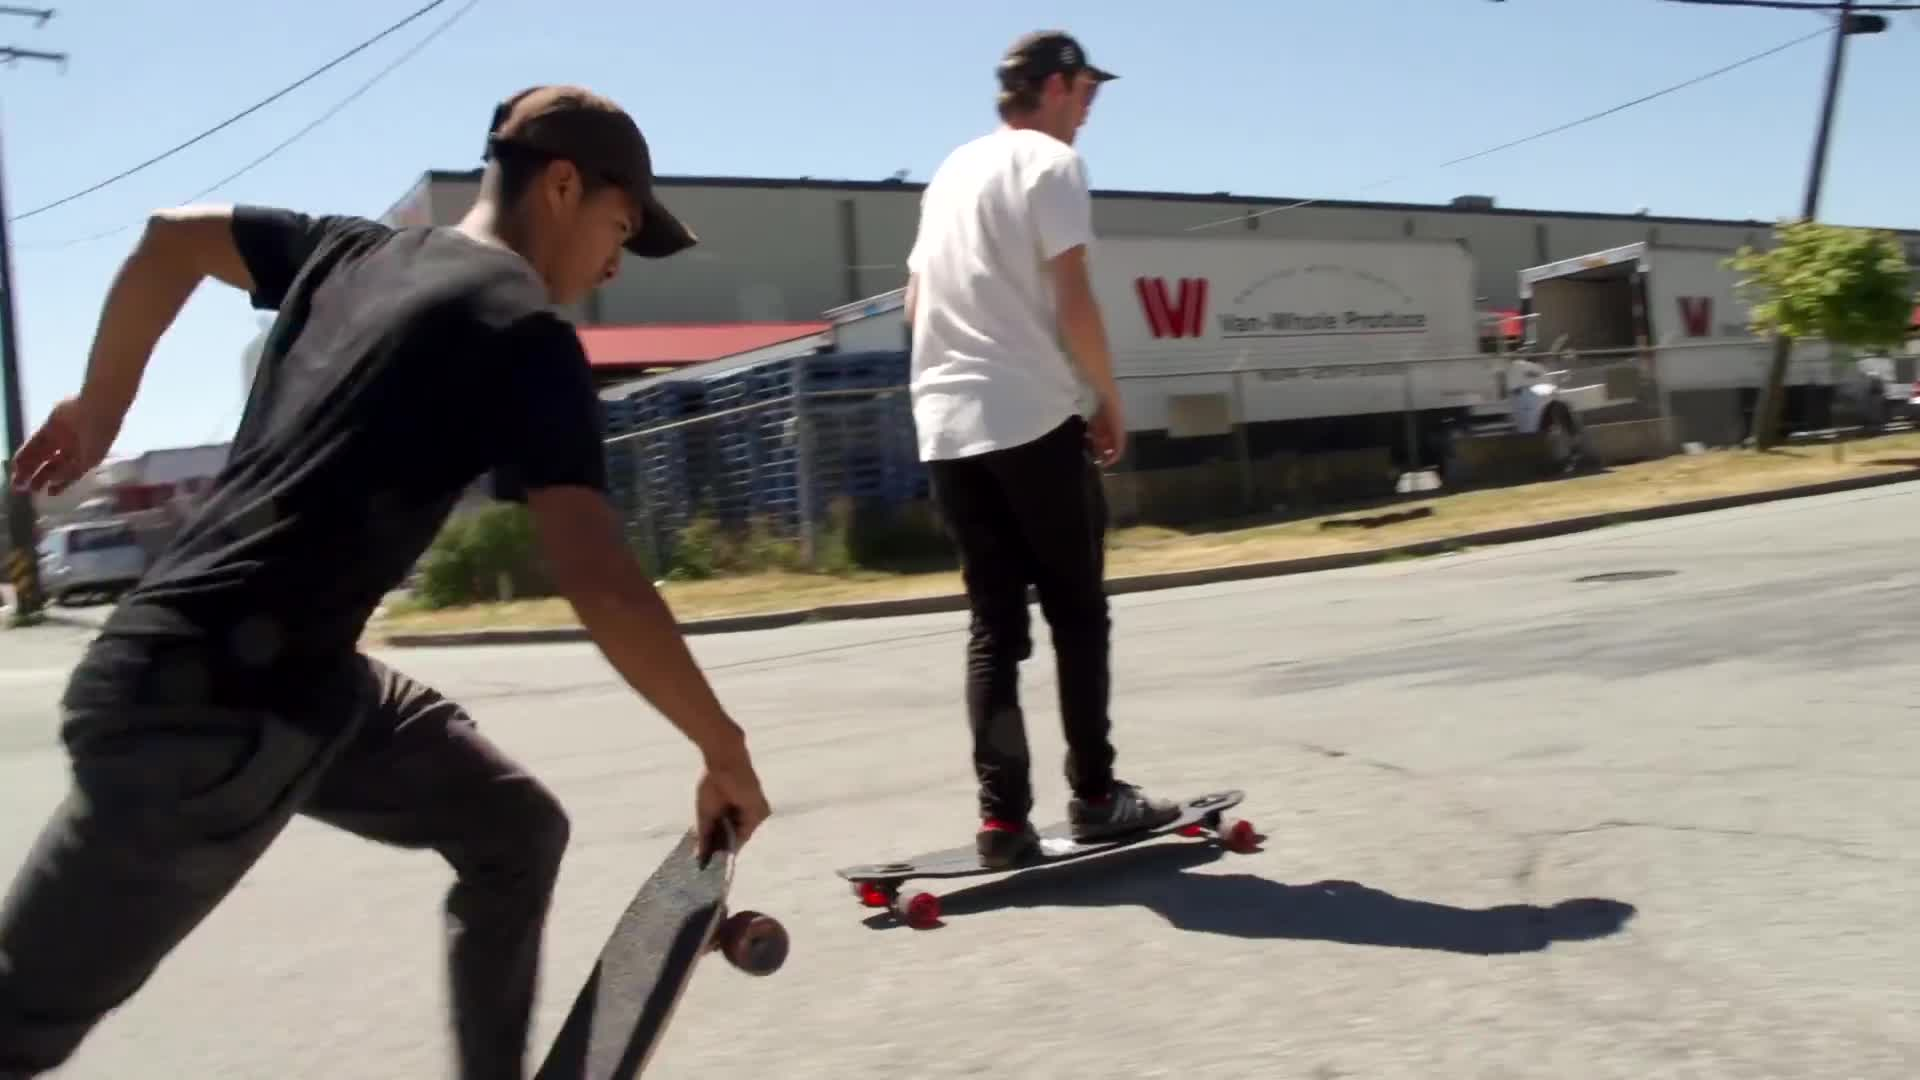 Dillon Stephens, Steven Vera, Vancouver, Vancouver Longboarding, Verafied, Vlog, chill longboarding, longboard vlog, longboarding vlog, skateboarding, CHILLEST DAY LONGBOARDING EVER GIFs